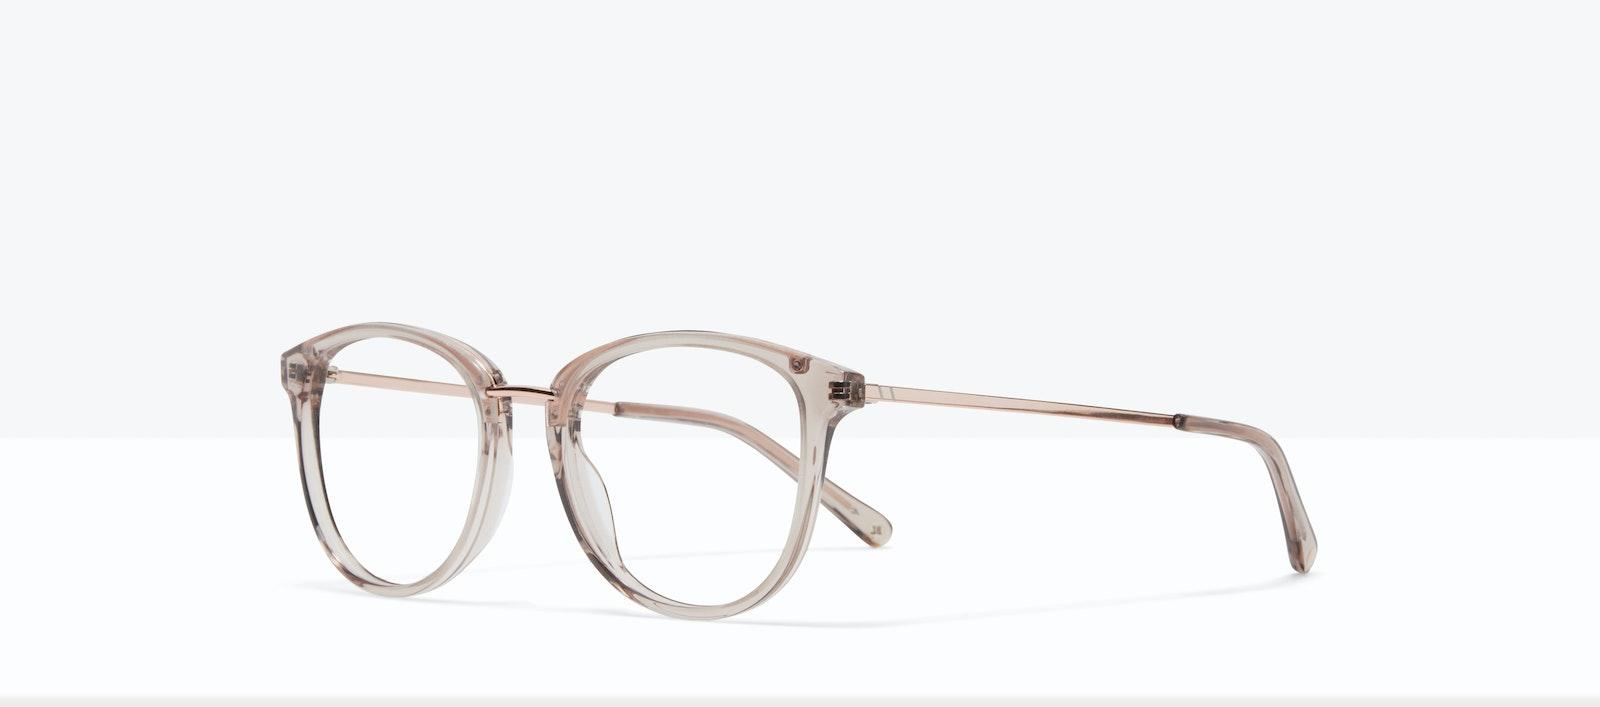 Affordable Fashion Glasses Square Round Eyeglasses Women Bella XS Sand Tilt